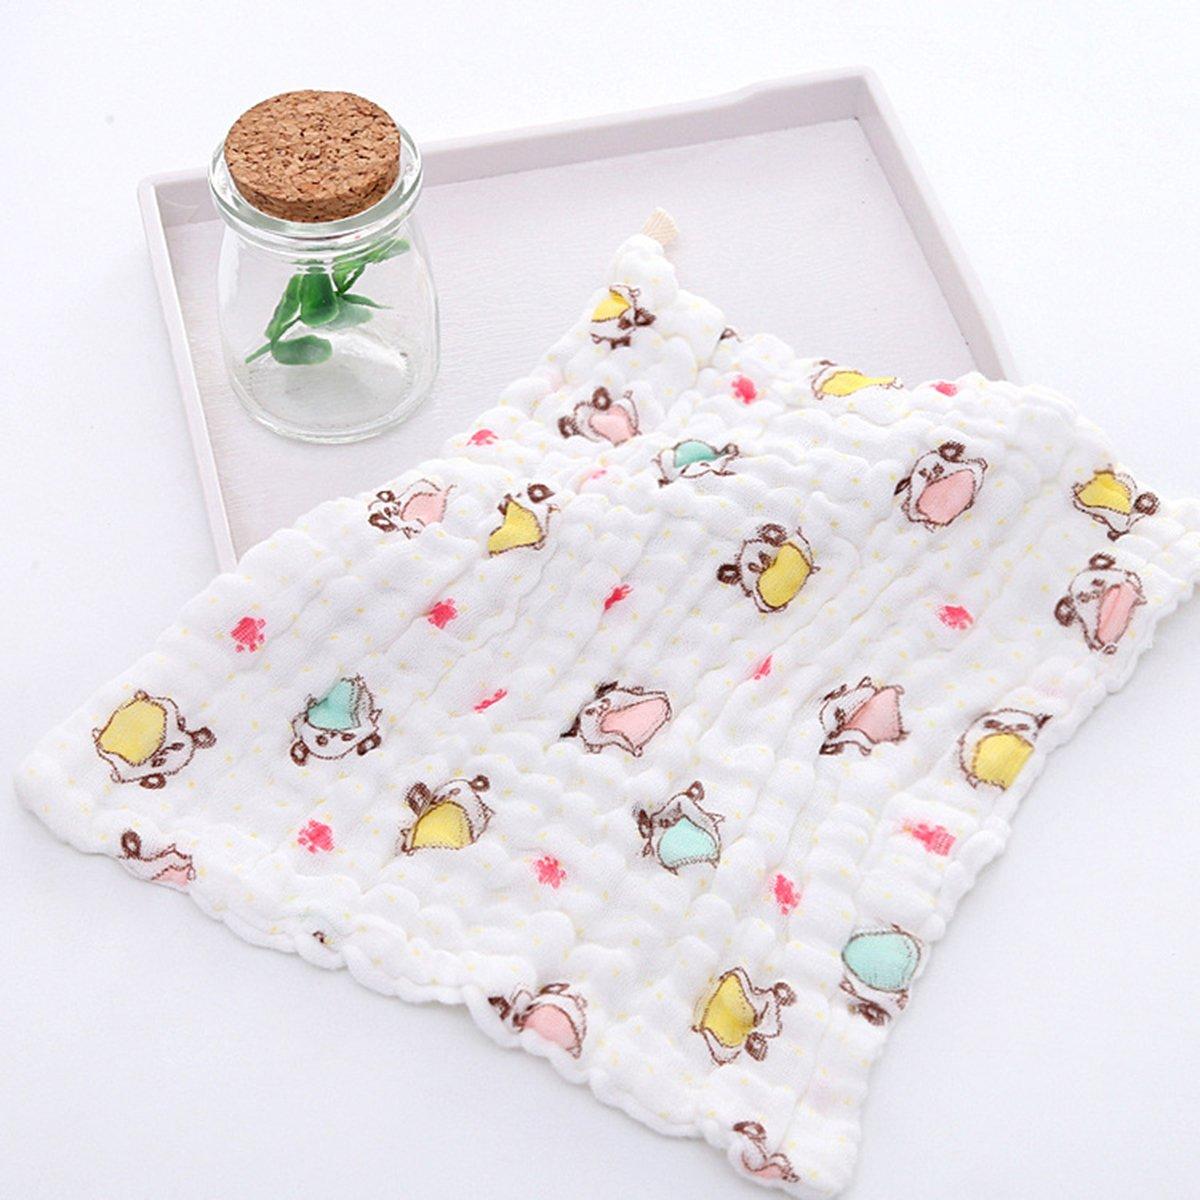 paquete de 5 Tukistore Toalla de beb/é reci/én nacido suave para beb/és Super absorbente de agua para beb/é y beb/és Pieles delicadas Toallitas de beb/é y muselina 11x11